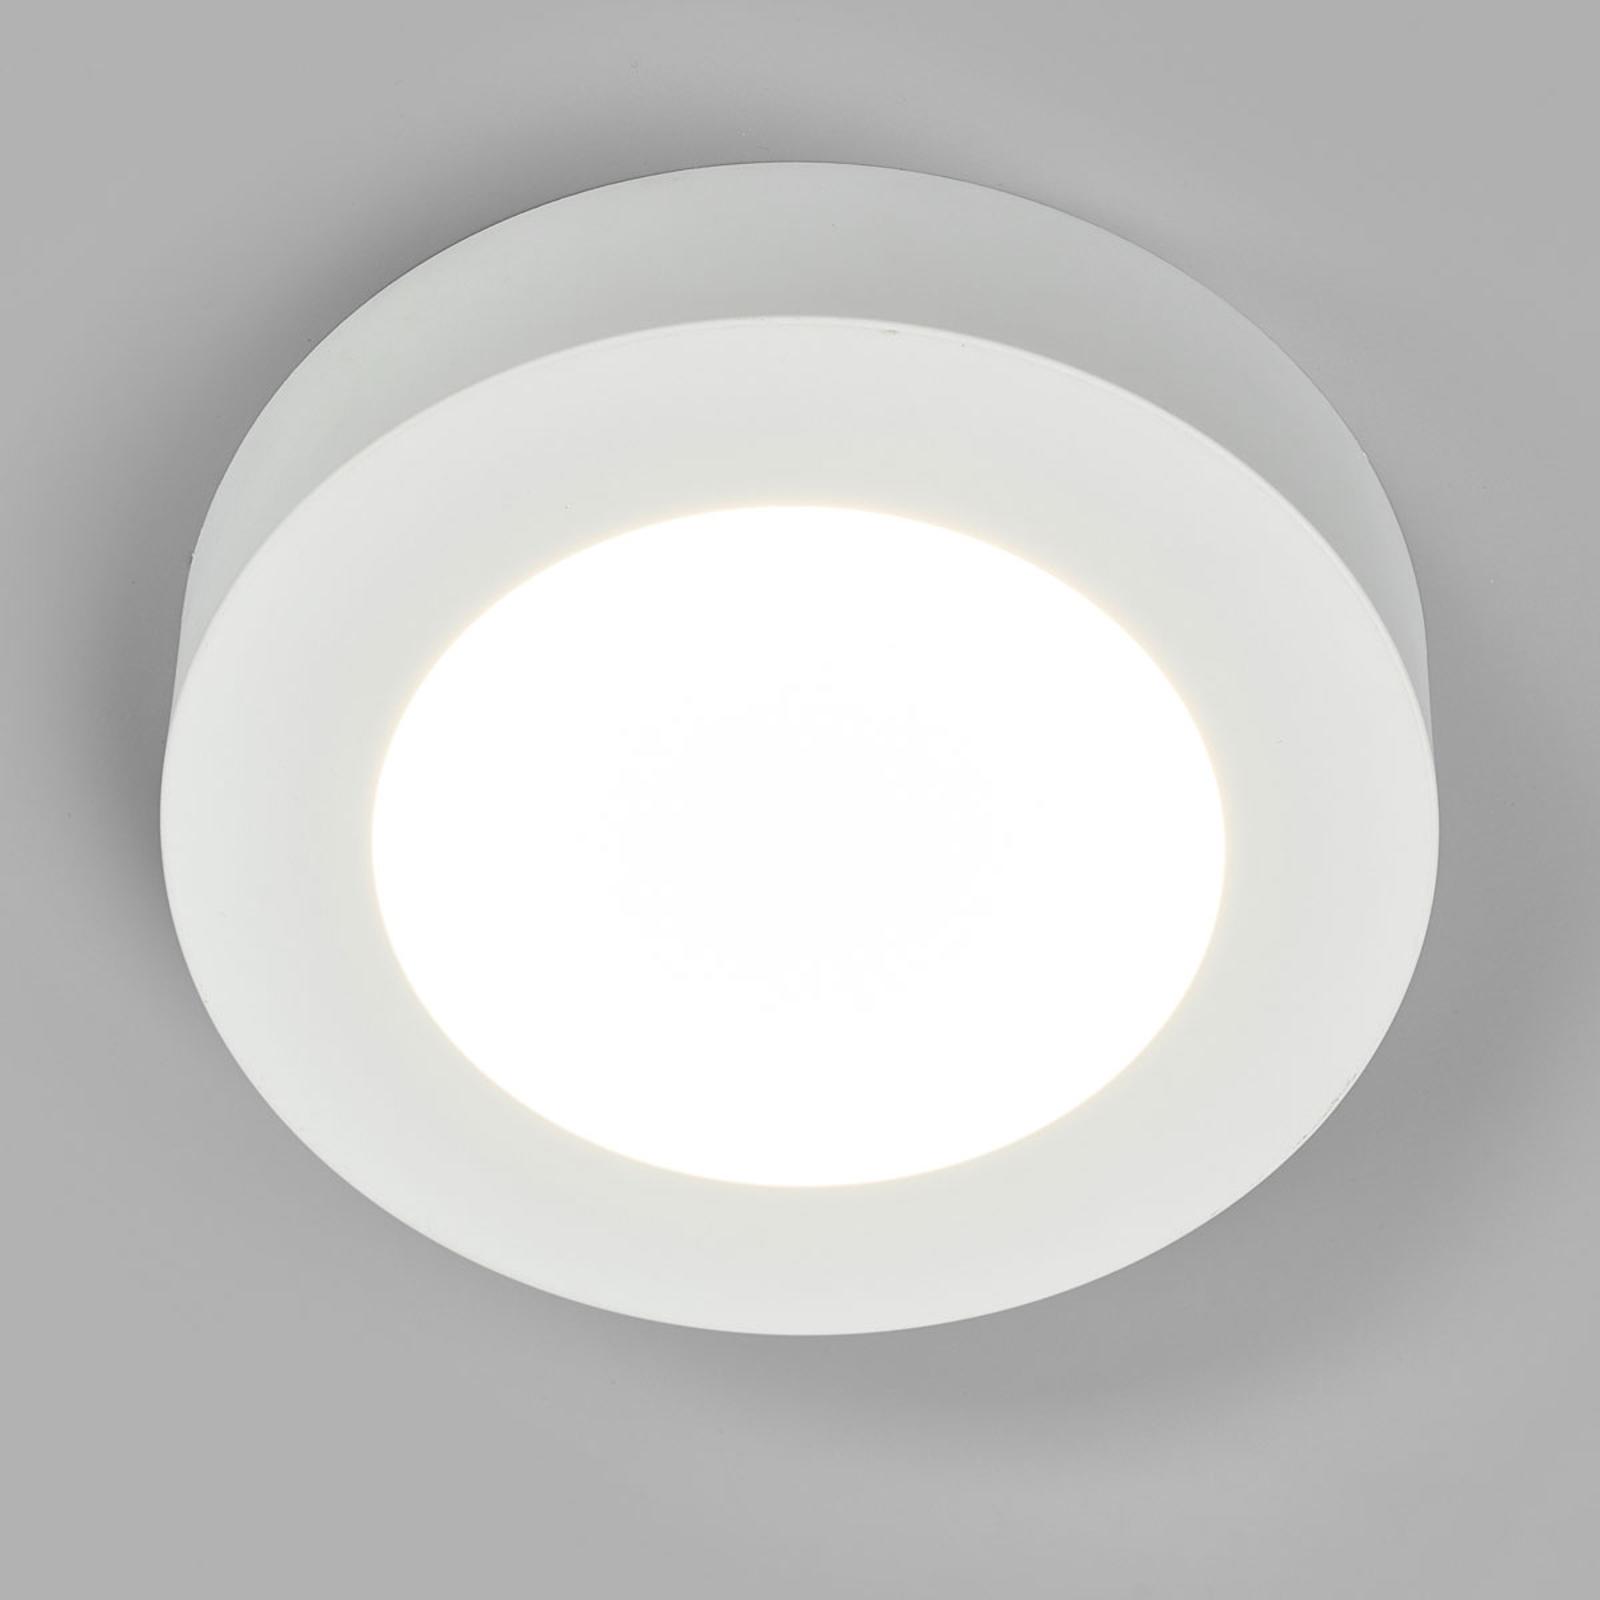 Plafonnier LED Marlo blanc 4000K rond 18,2cm